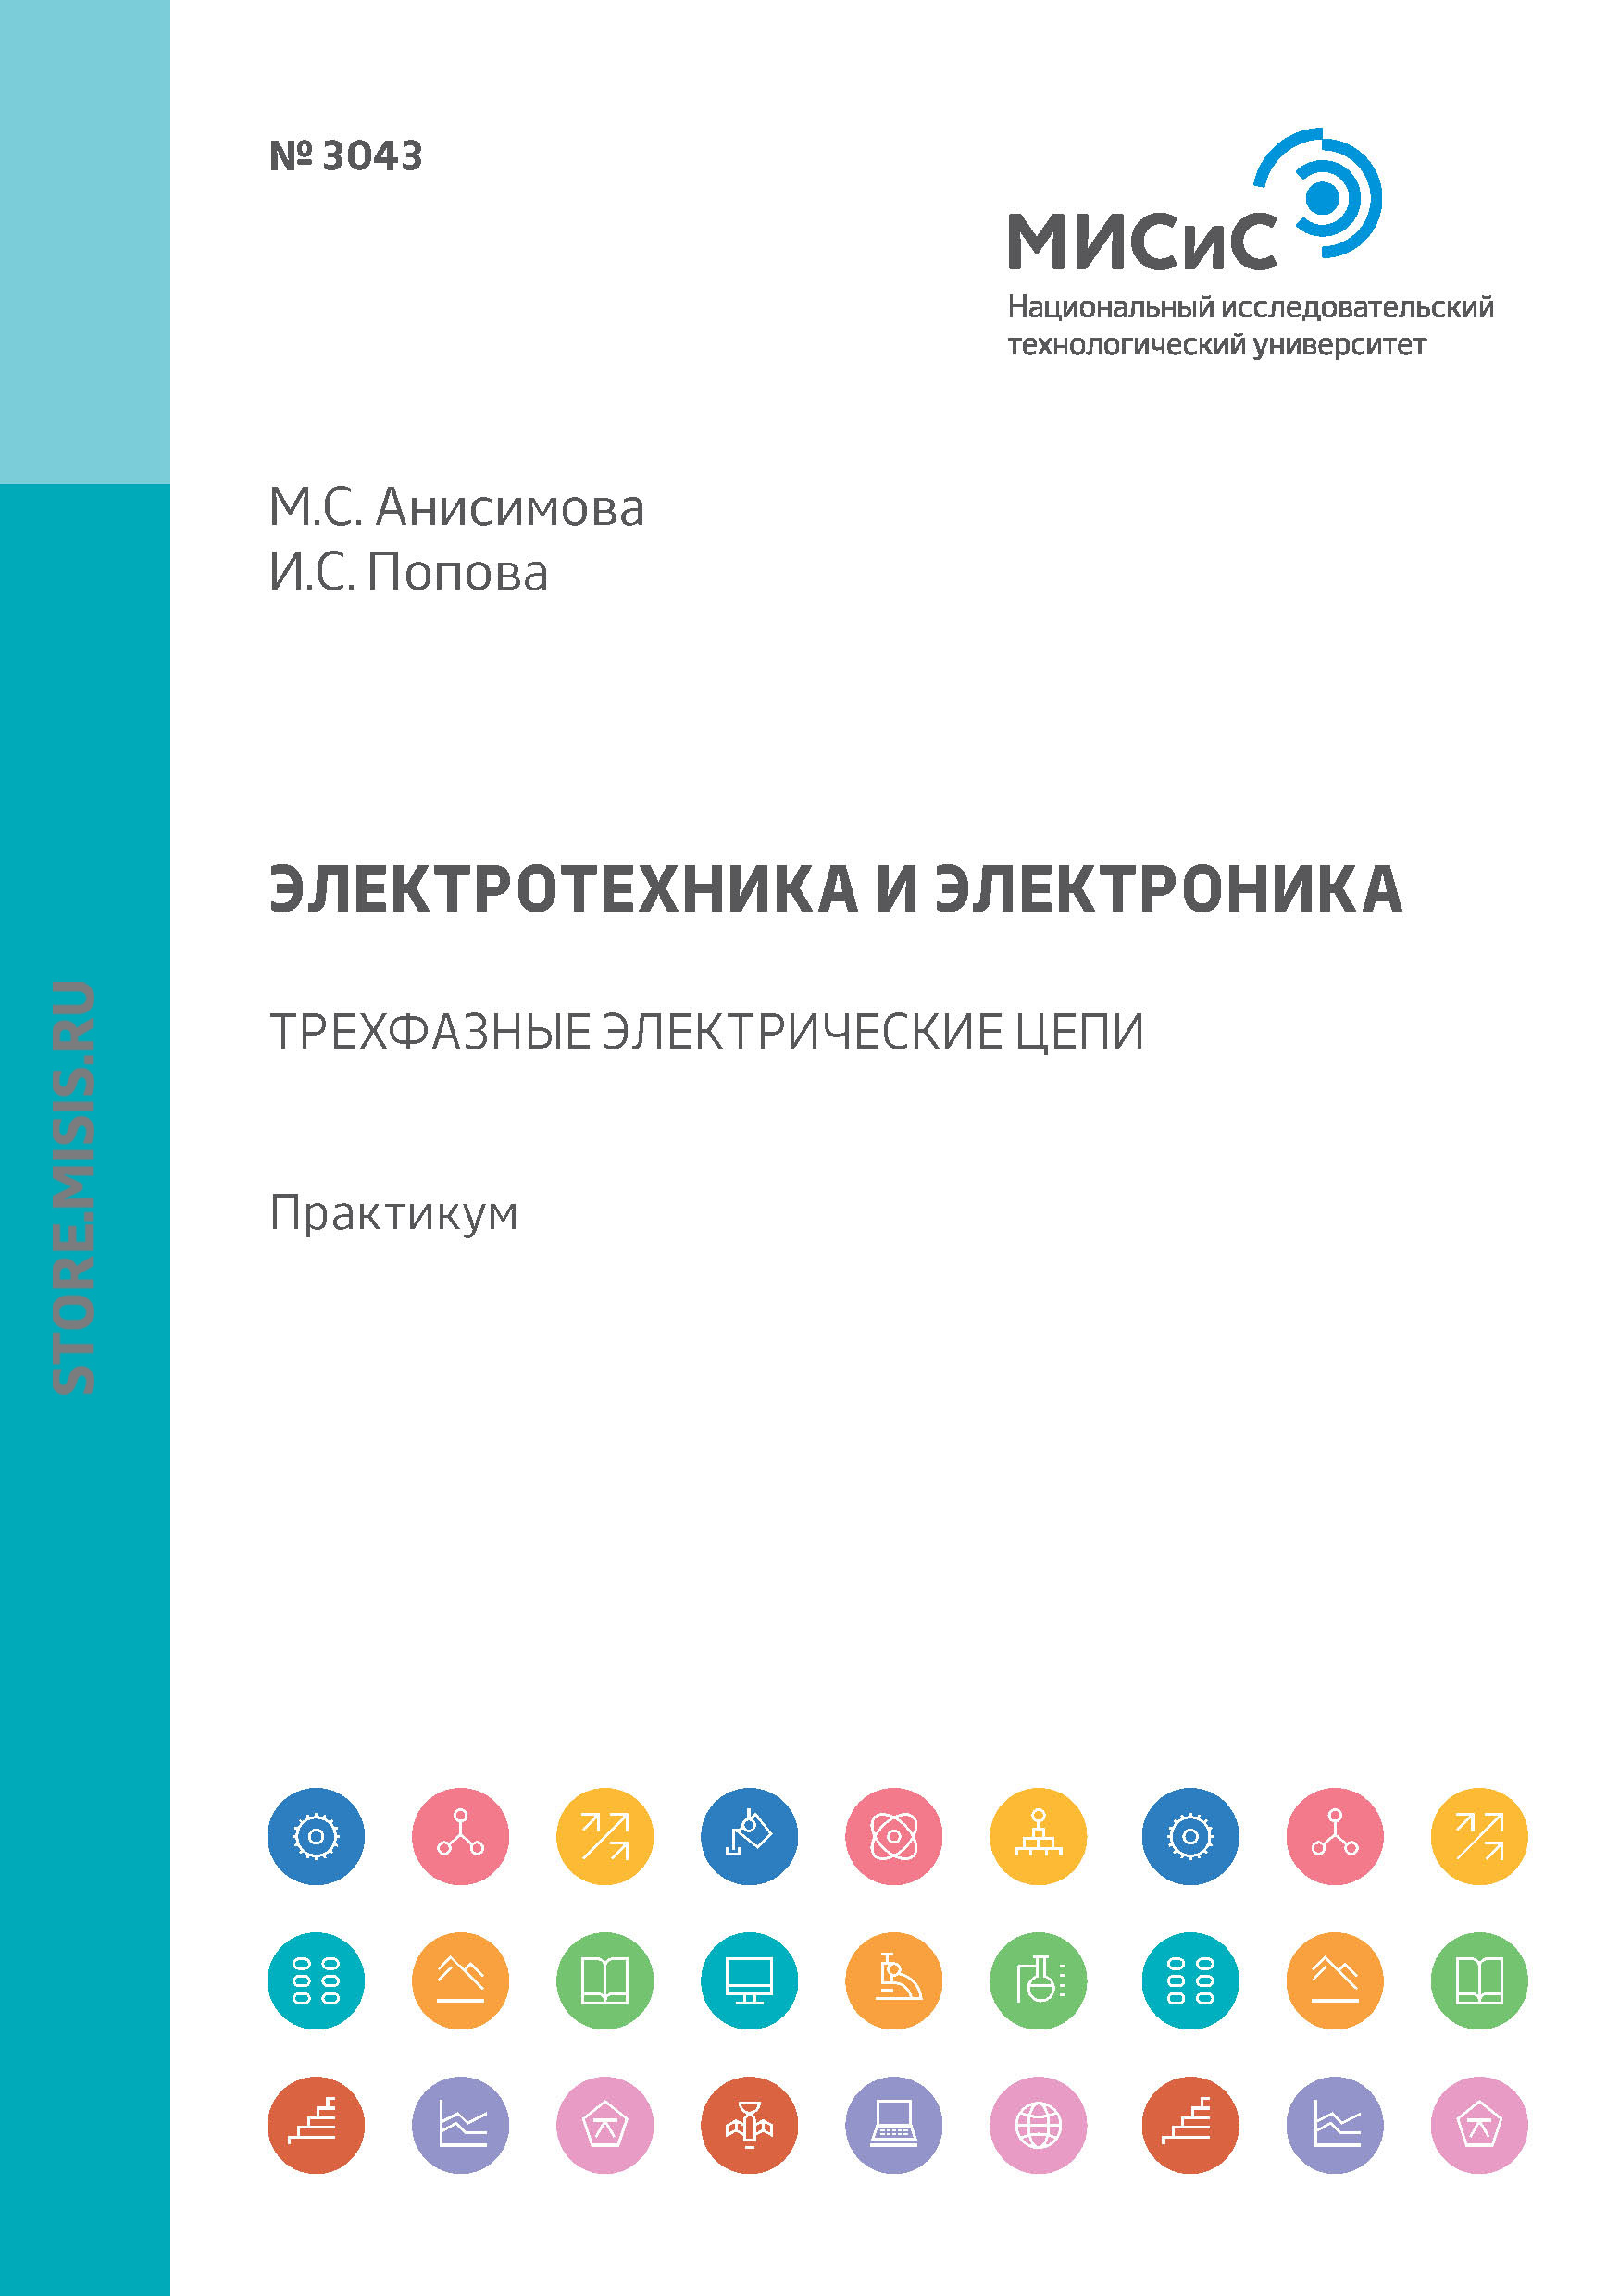 цена на М. С. Анисимова Электротехника и электроника. Трехфазные электрические цепи. Практикум